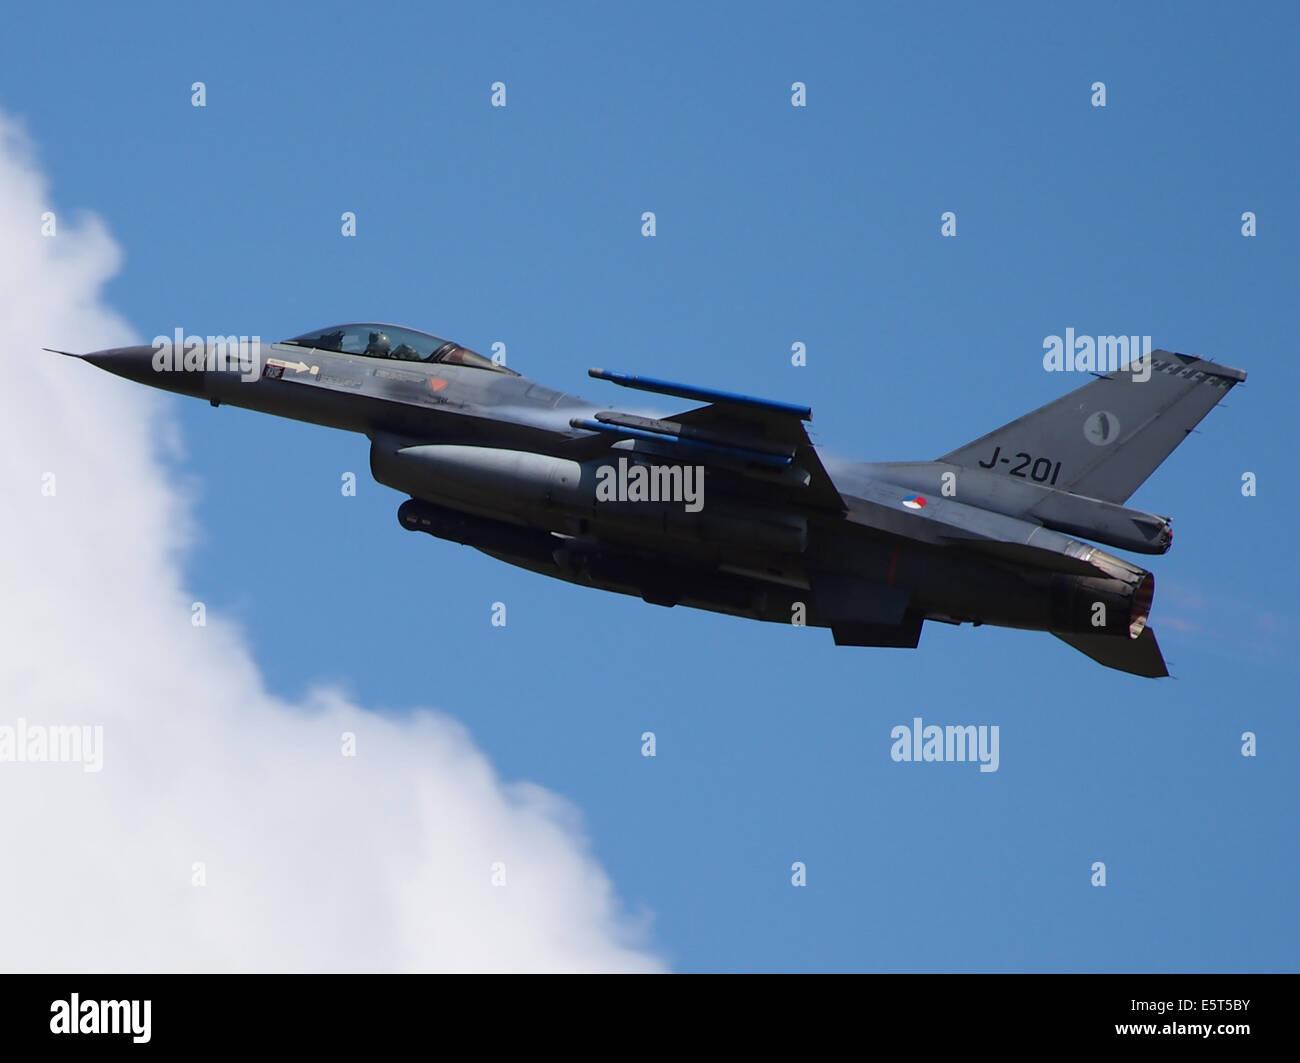 J-201 General Dynamics F-16AM Fighting Falcon - Stock Image